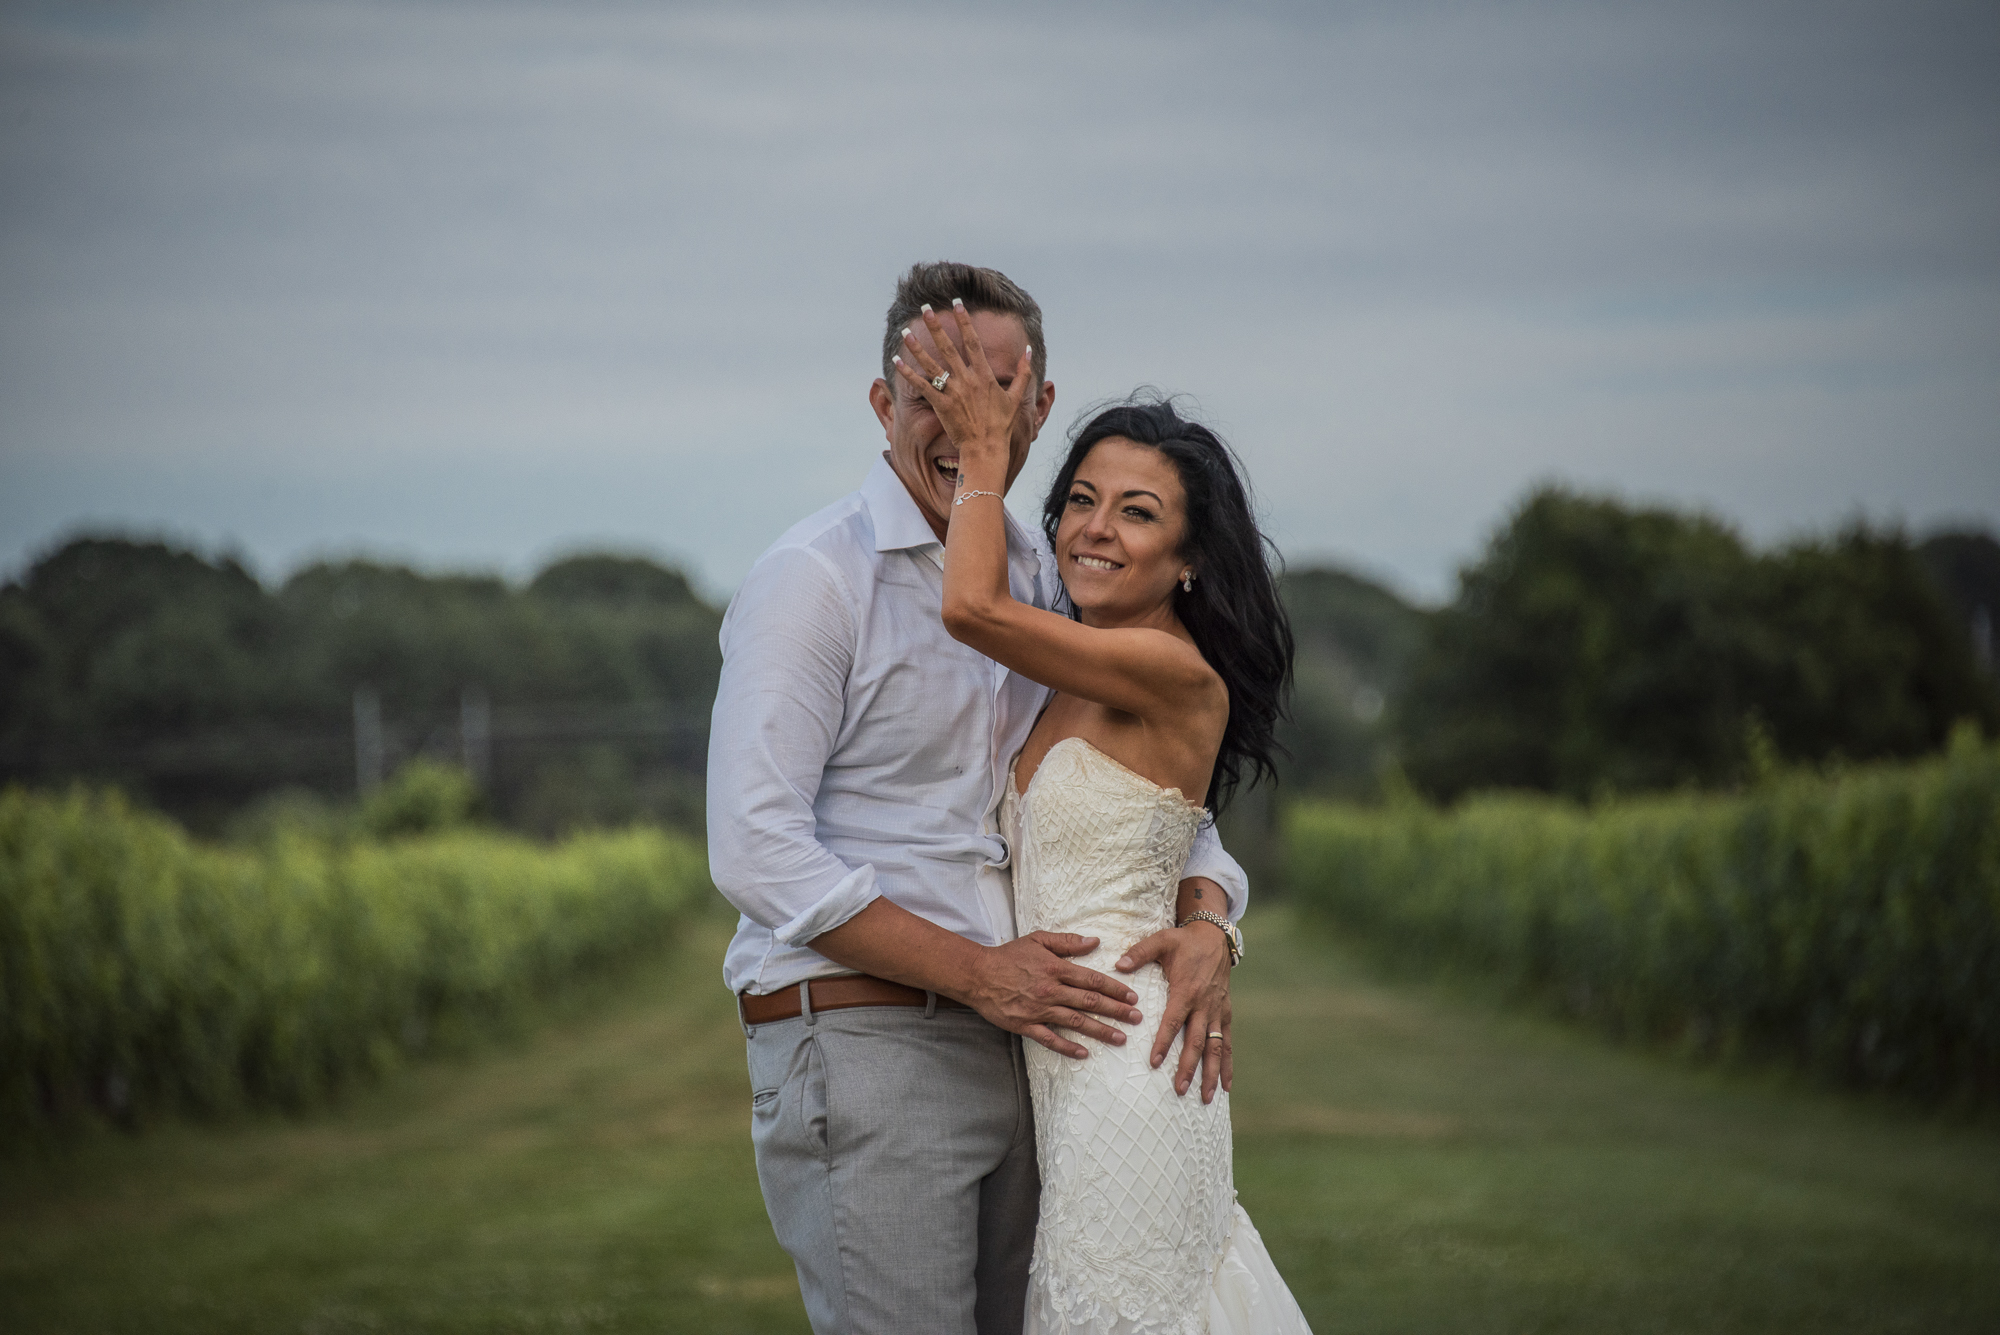 Ashley and Patrick Flynn-20180721-4804-RT-2000.jpg